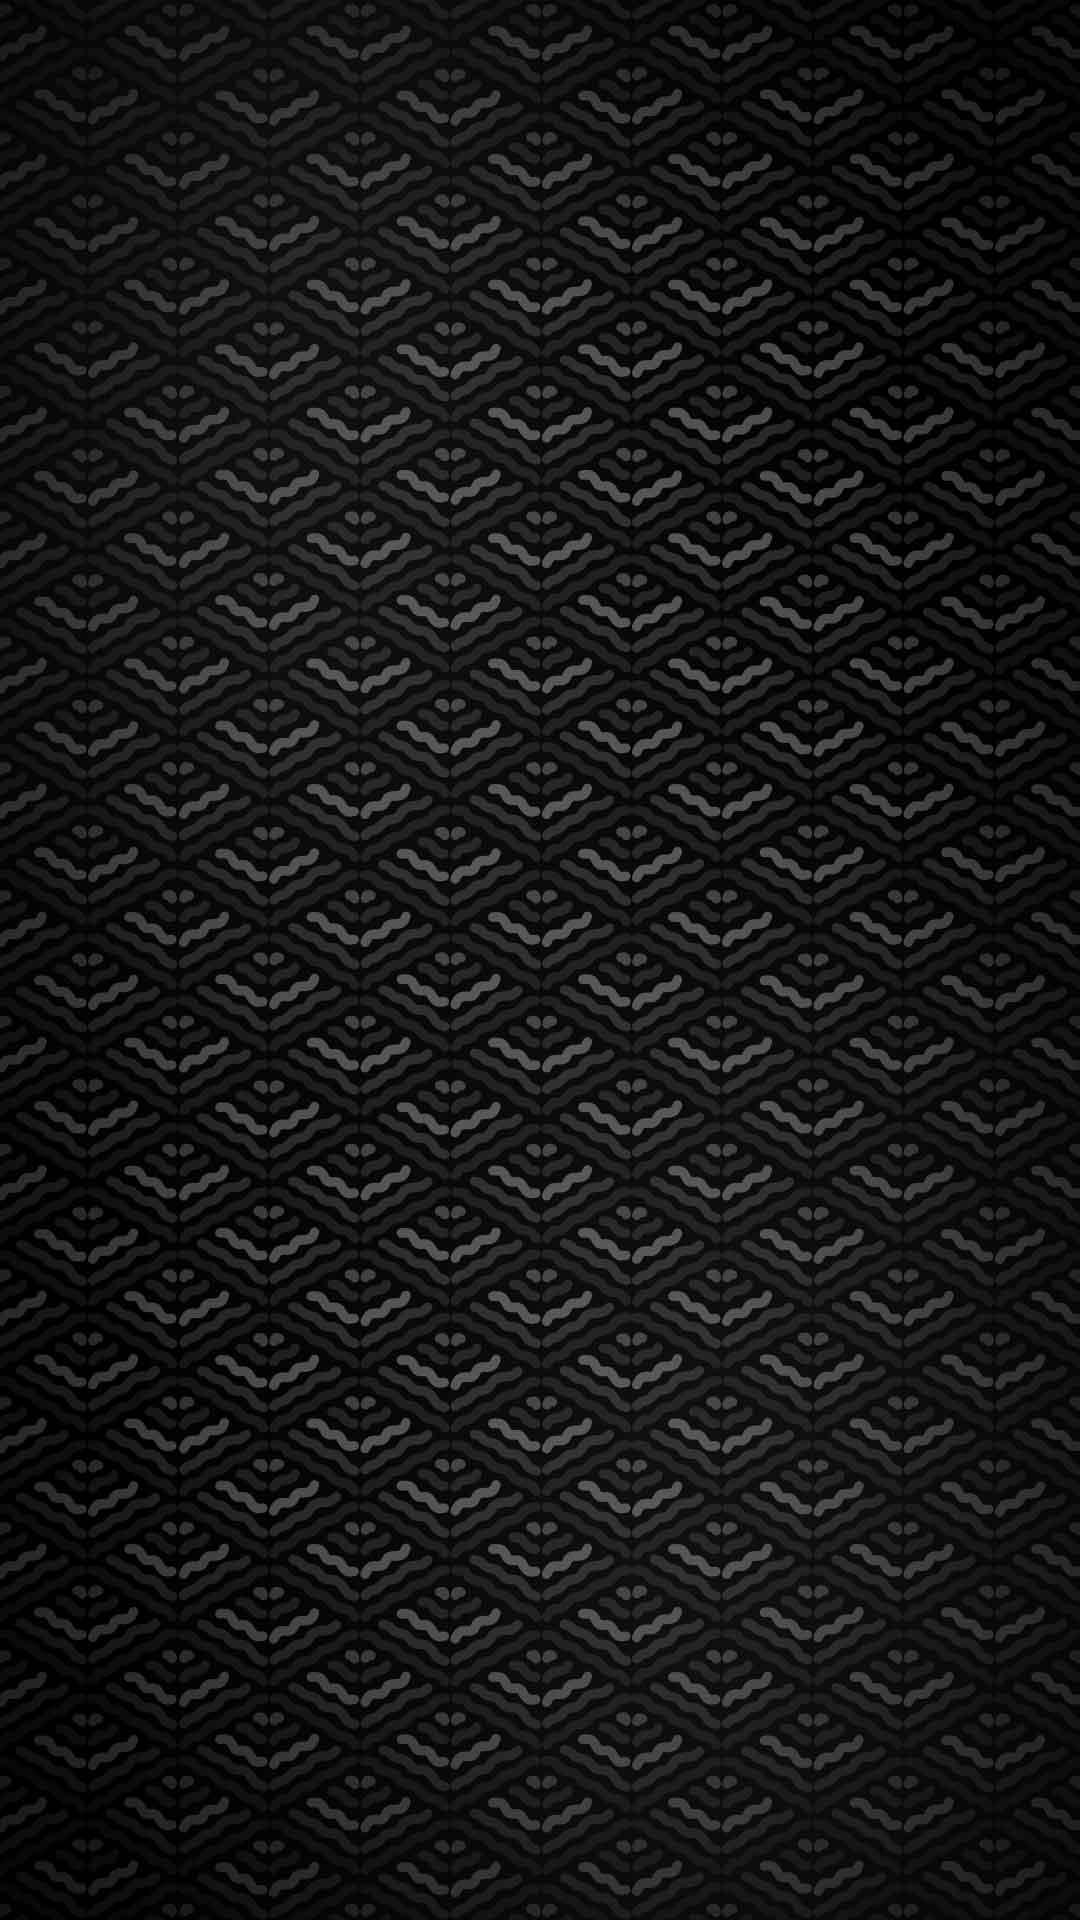 black wallpaper 1080x1920